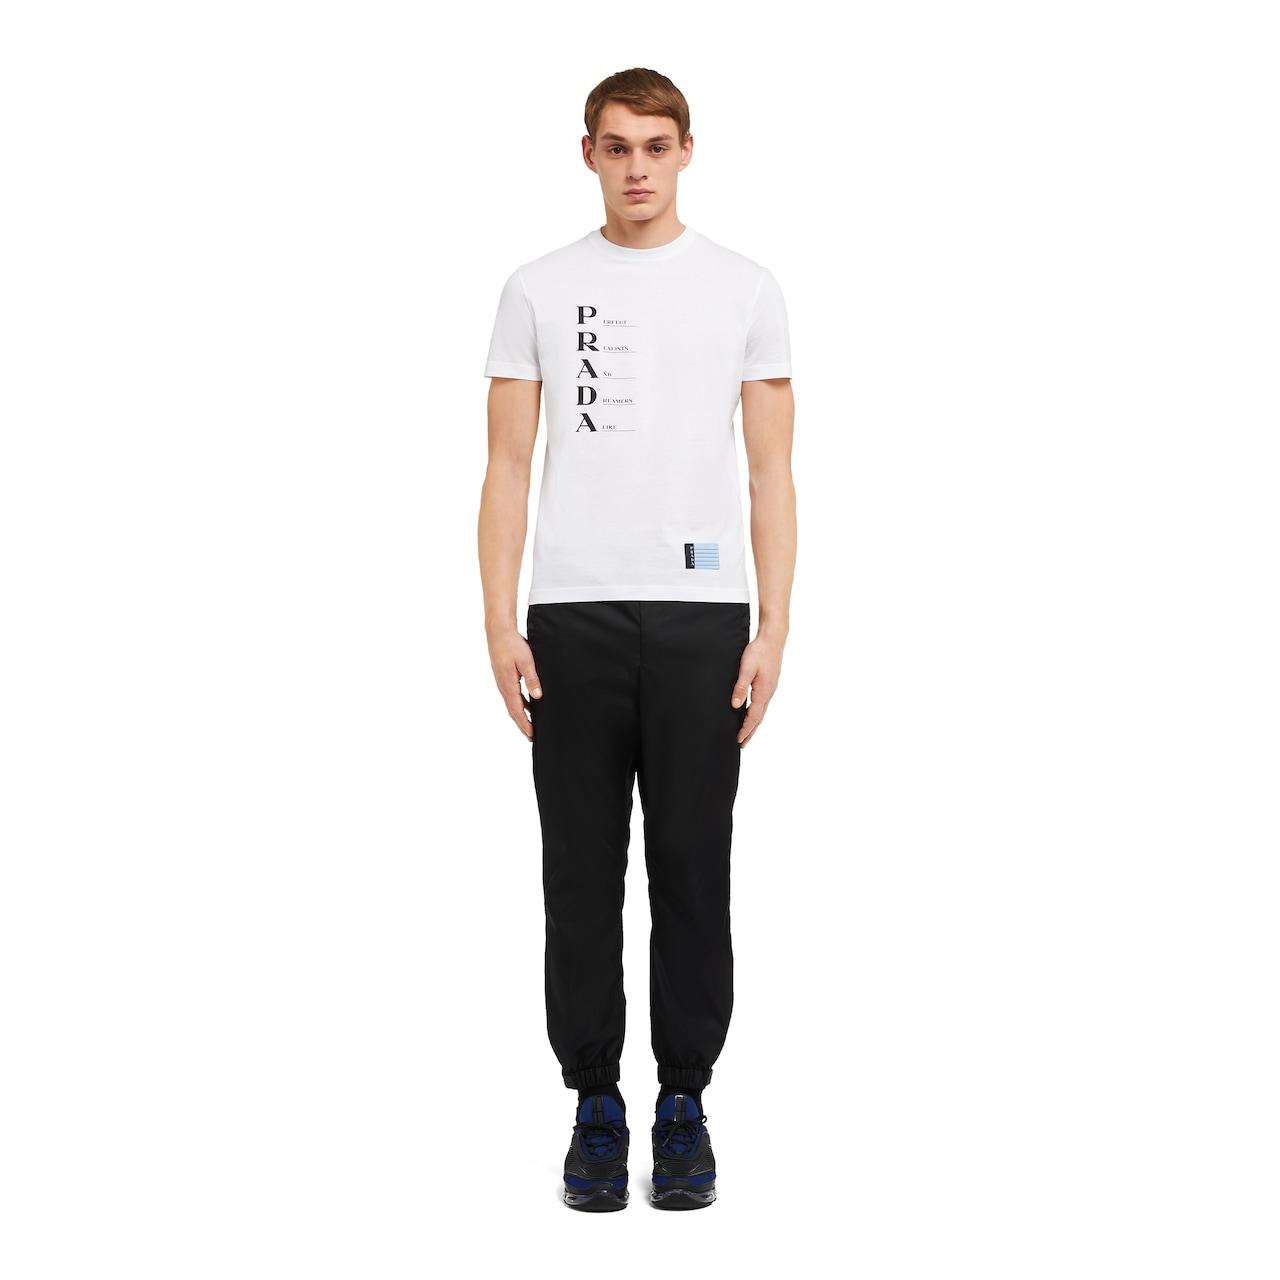 Prada Cotton Jersey T-shirt 2